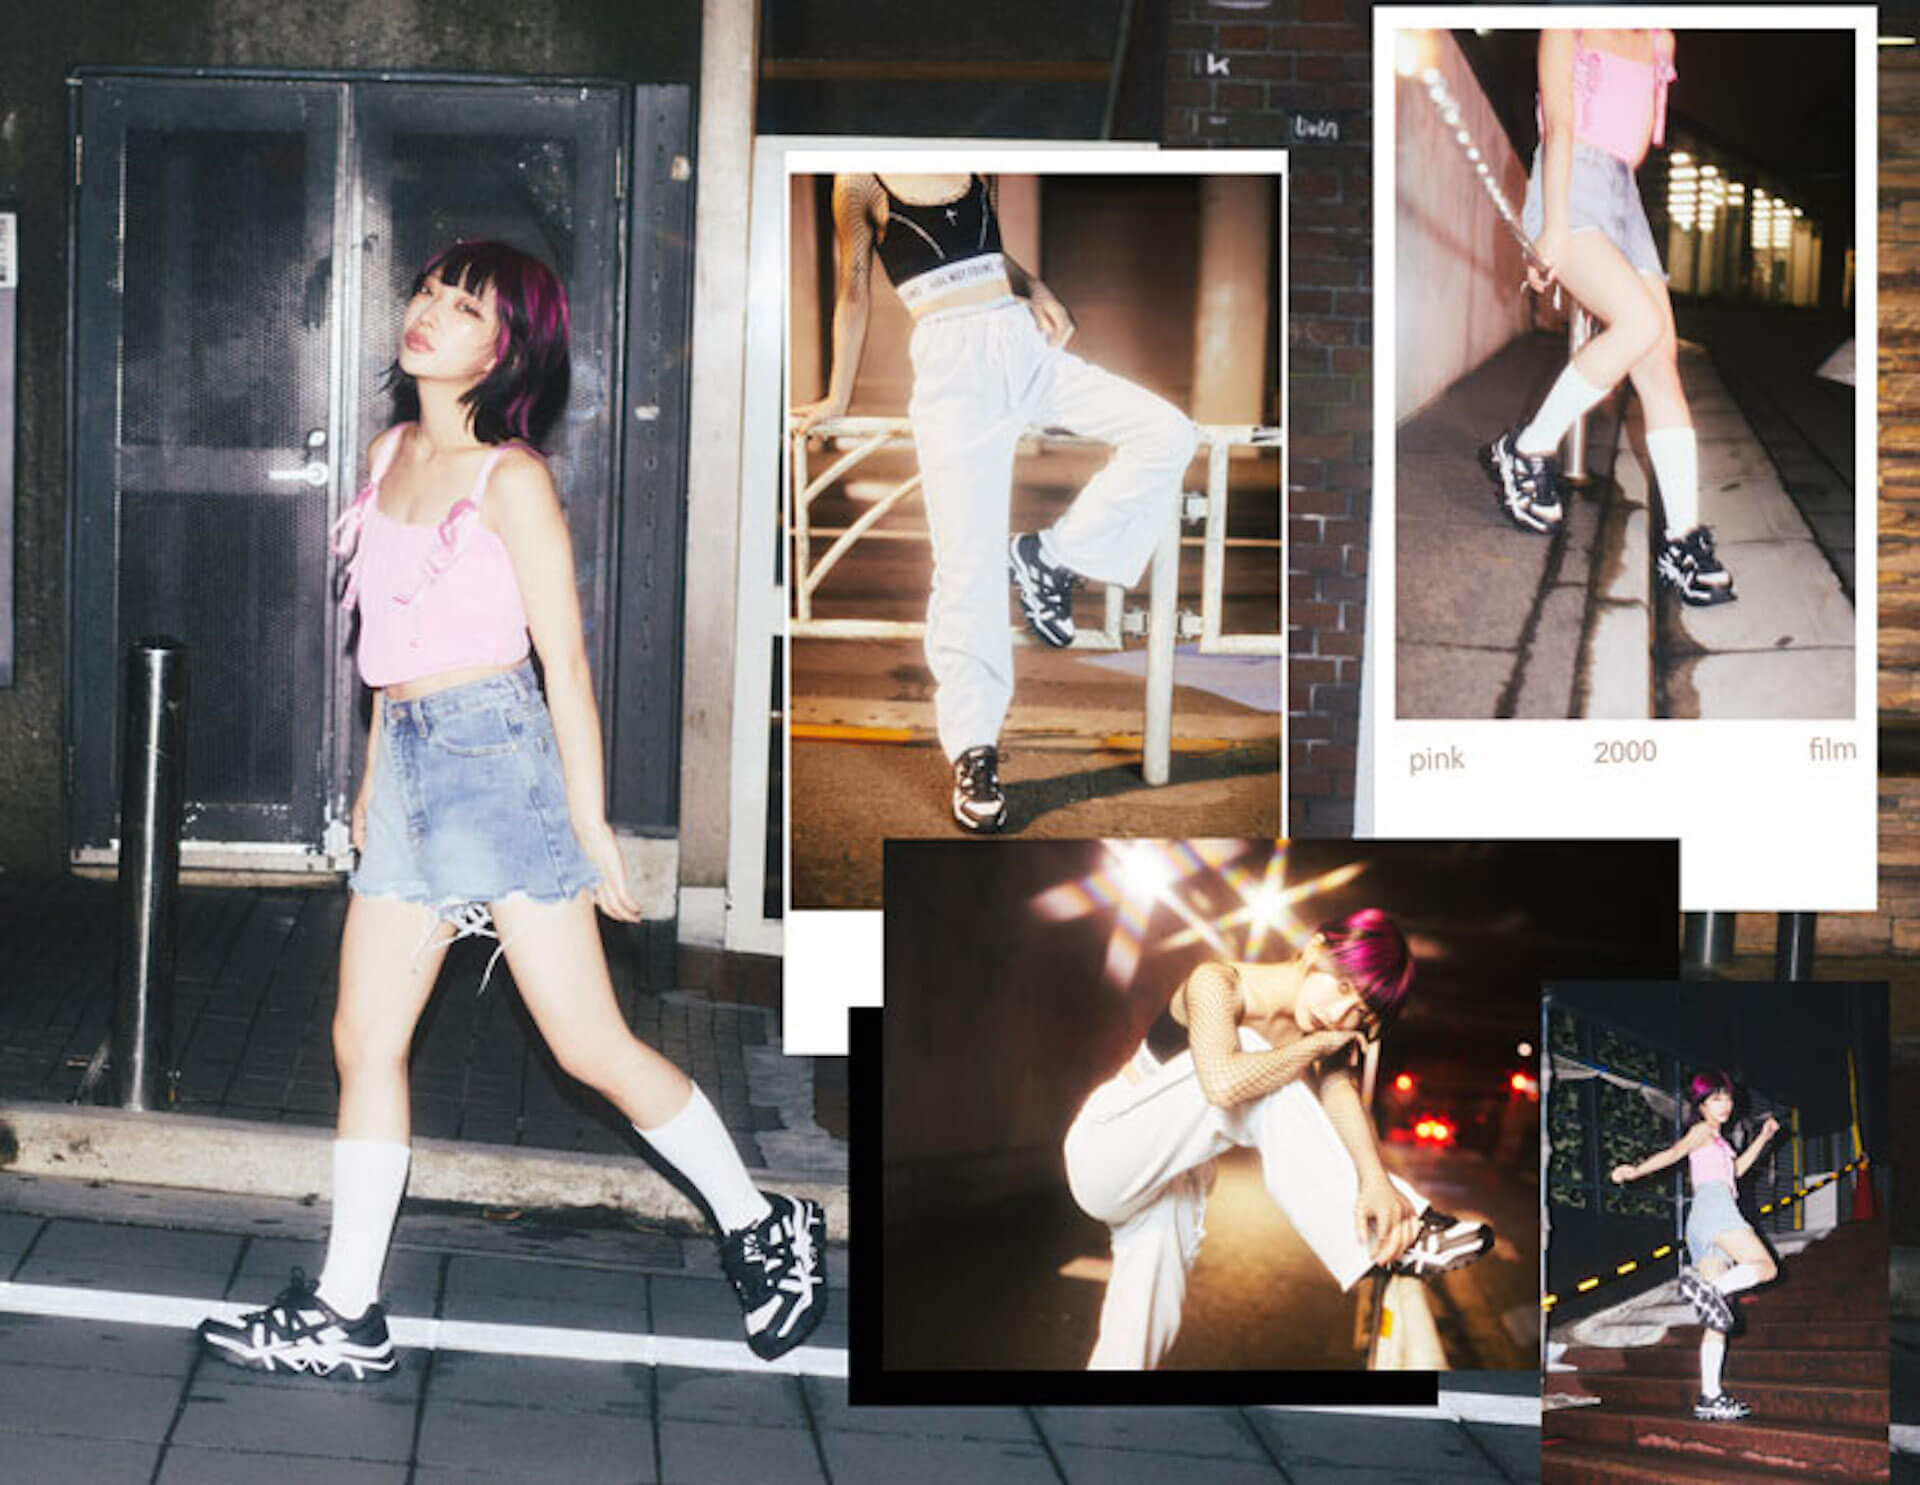 KATY×FILA×atmos pinkトリプルコラボの『Z BUFFER 2』が発売決定!KATYとチェキ撮影イベントも Fashion210629_katy13